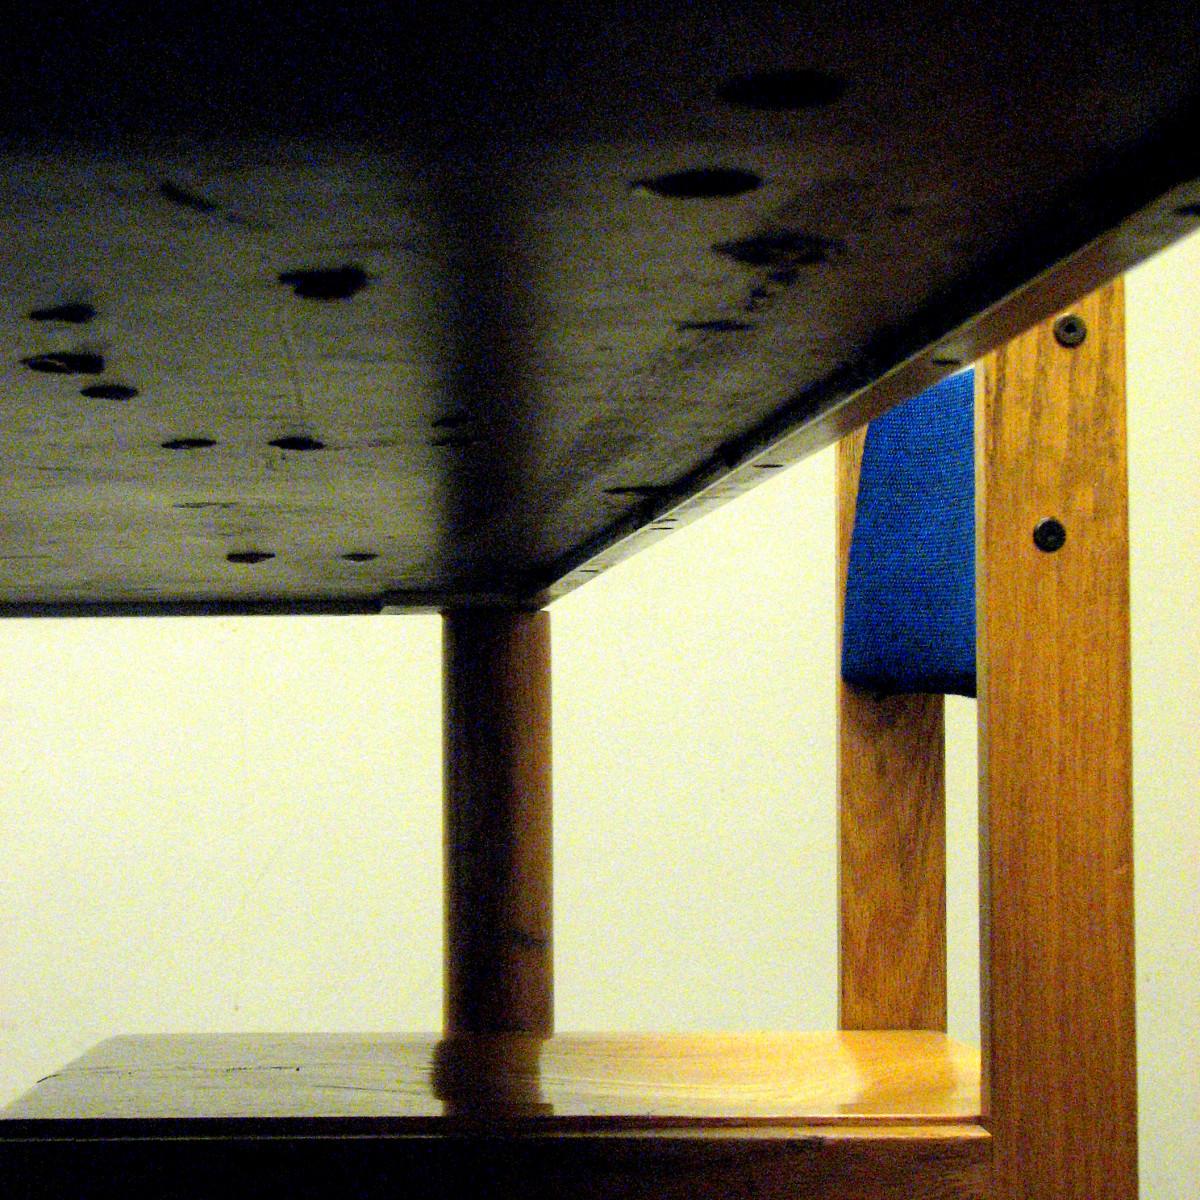 Fotos gratis escritorio mesa madera silla mueble for Estudiar diseno de interiores online gratis